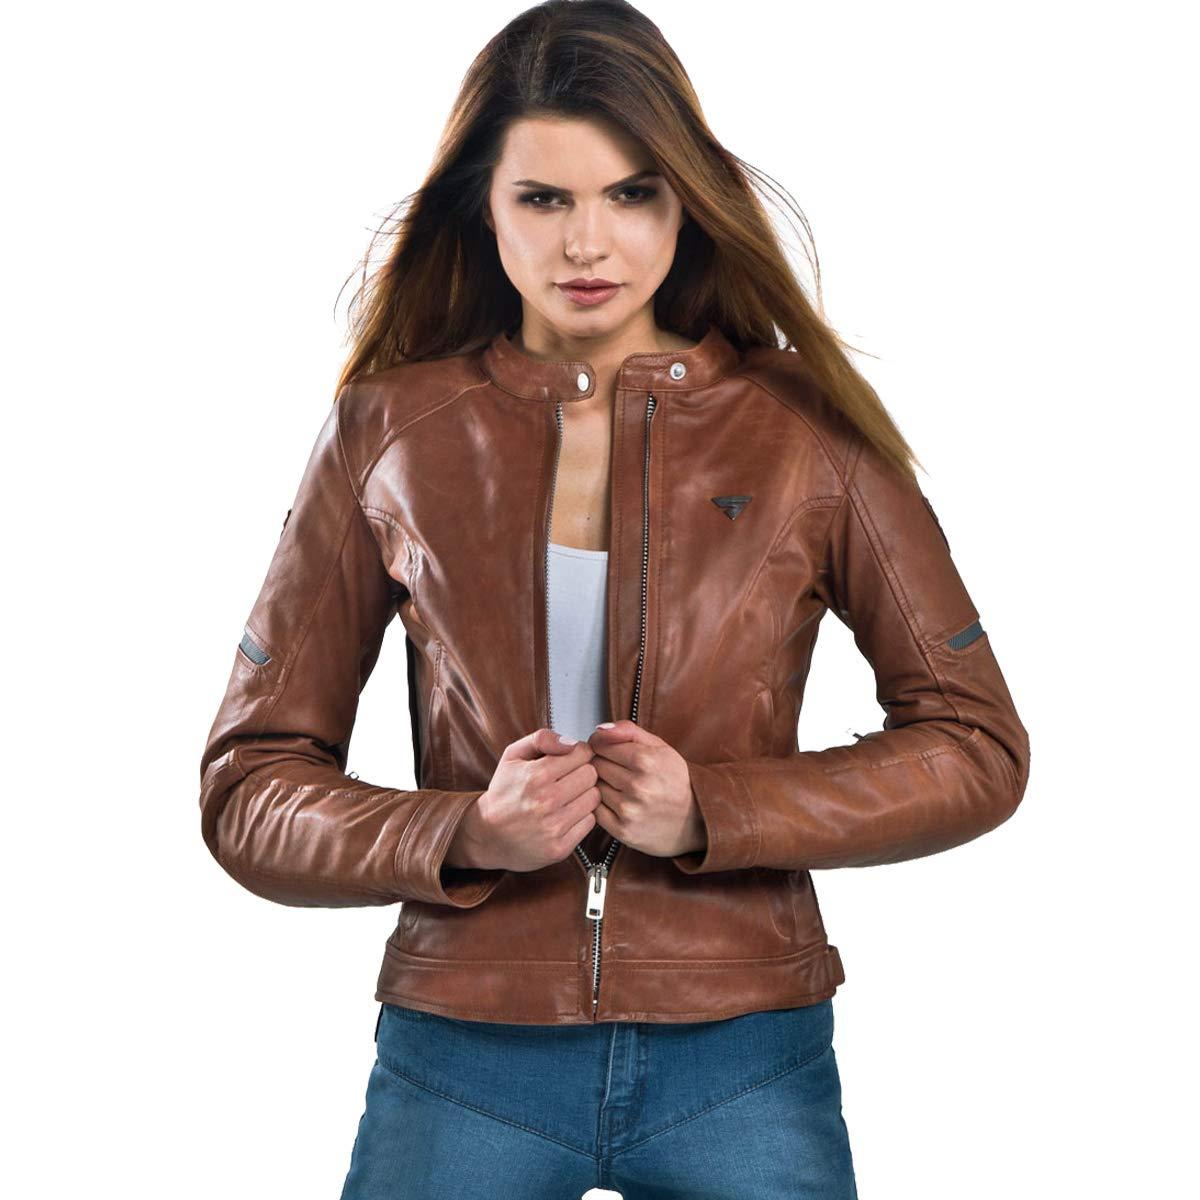 SHIMA Monaco Lady Leather Vintage Classic Motorcycle Jacket - Brown/Medium